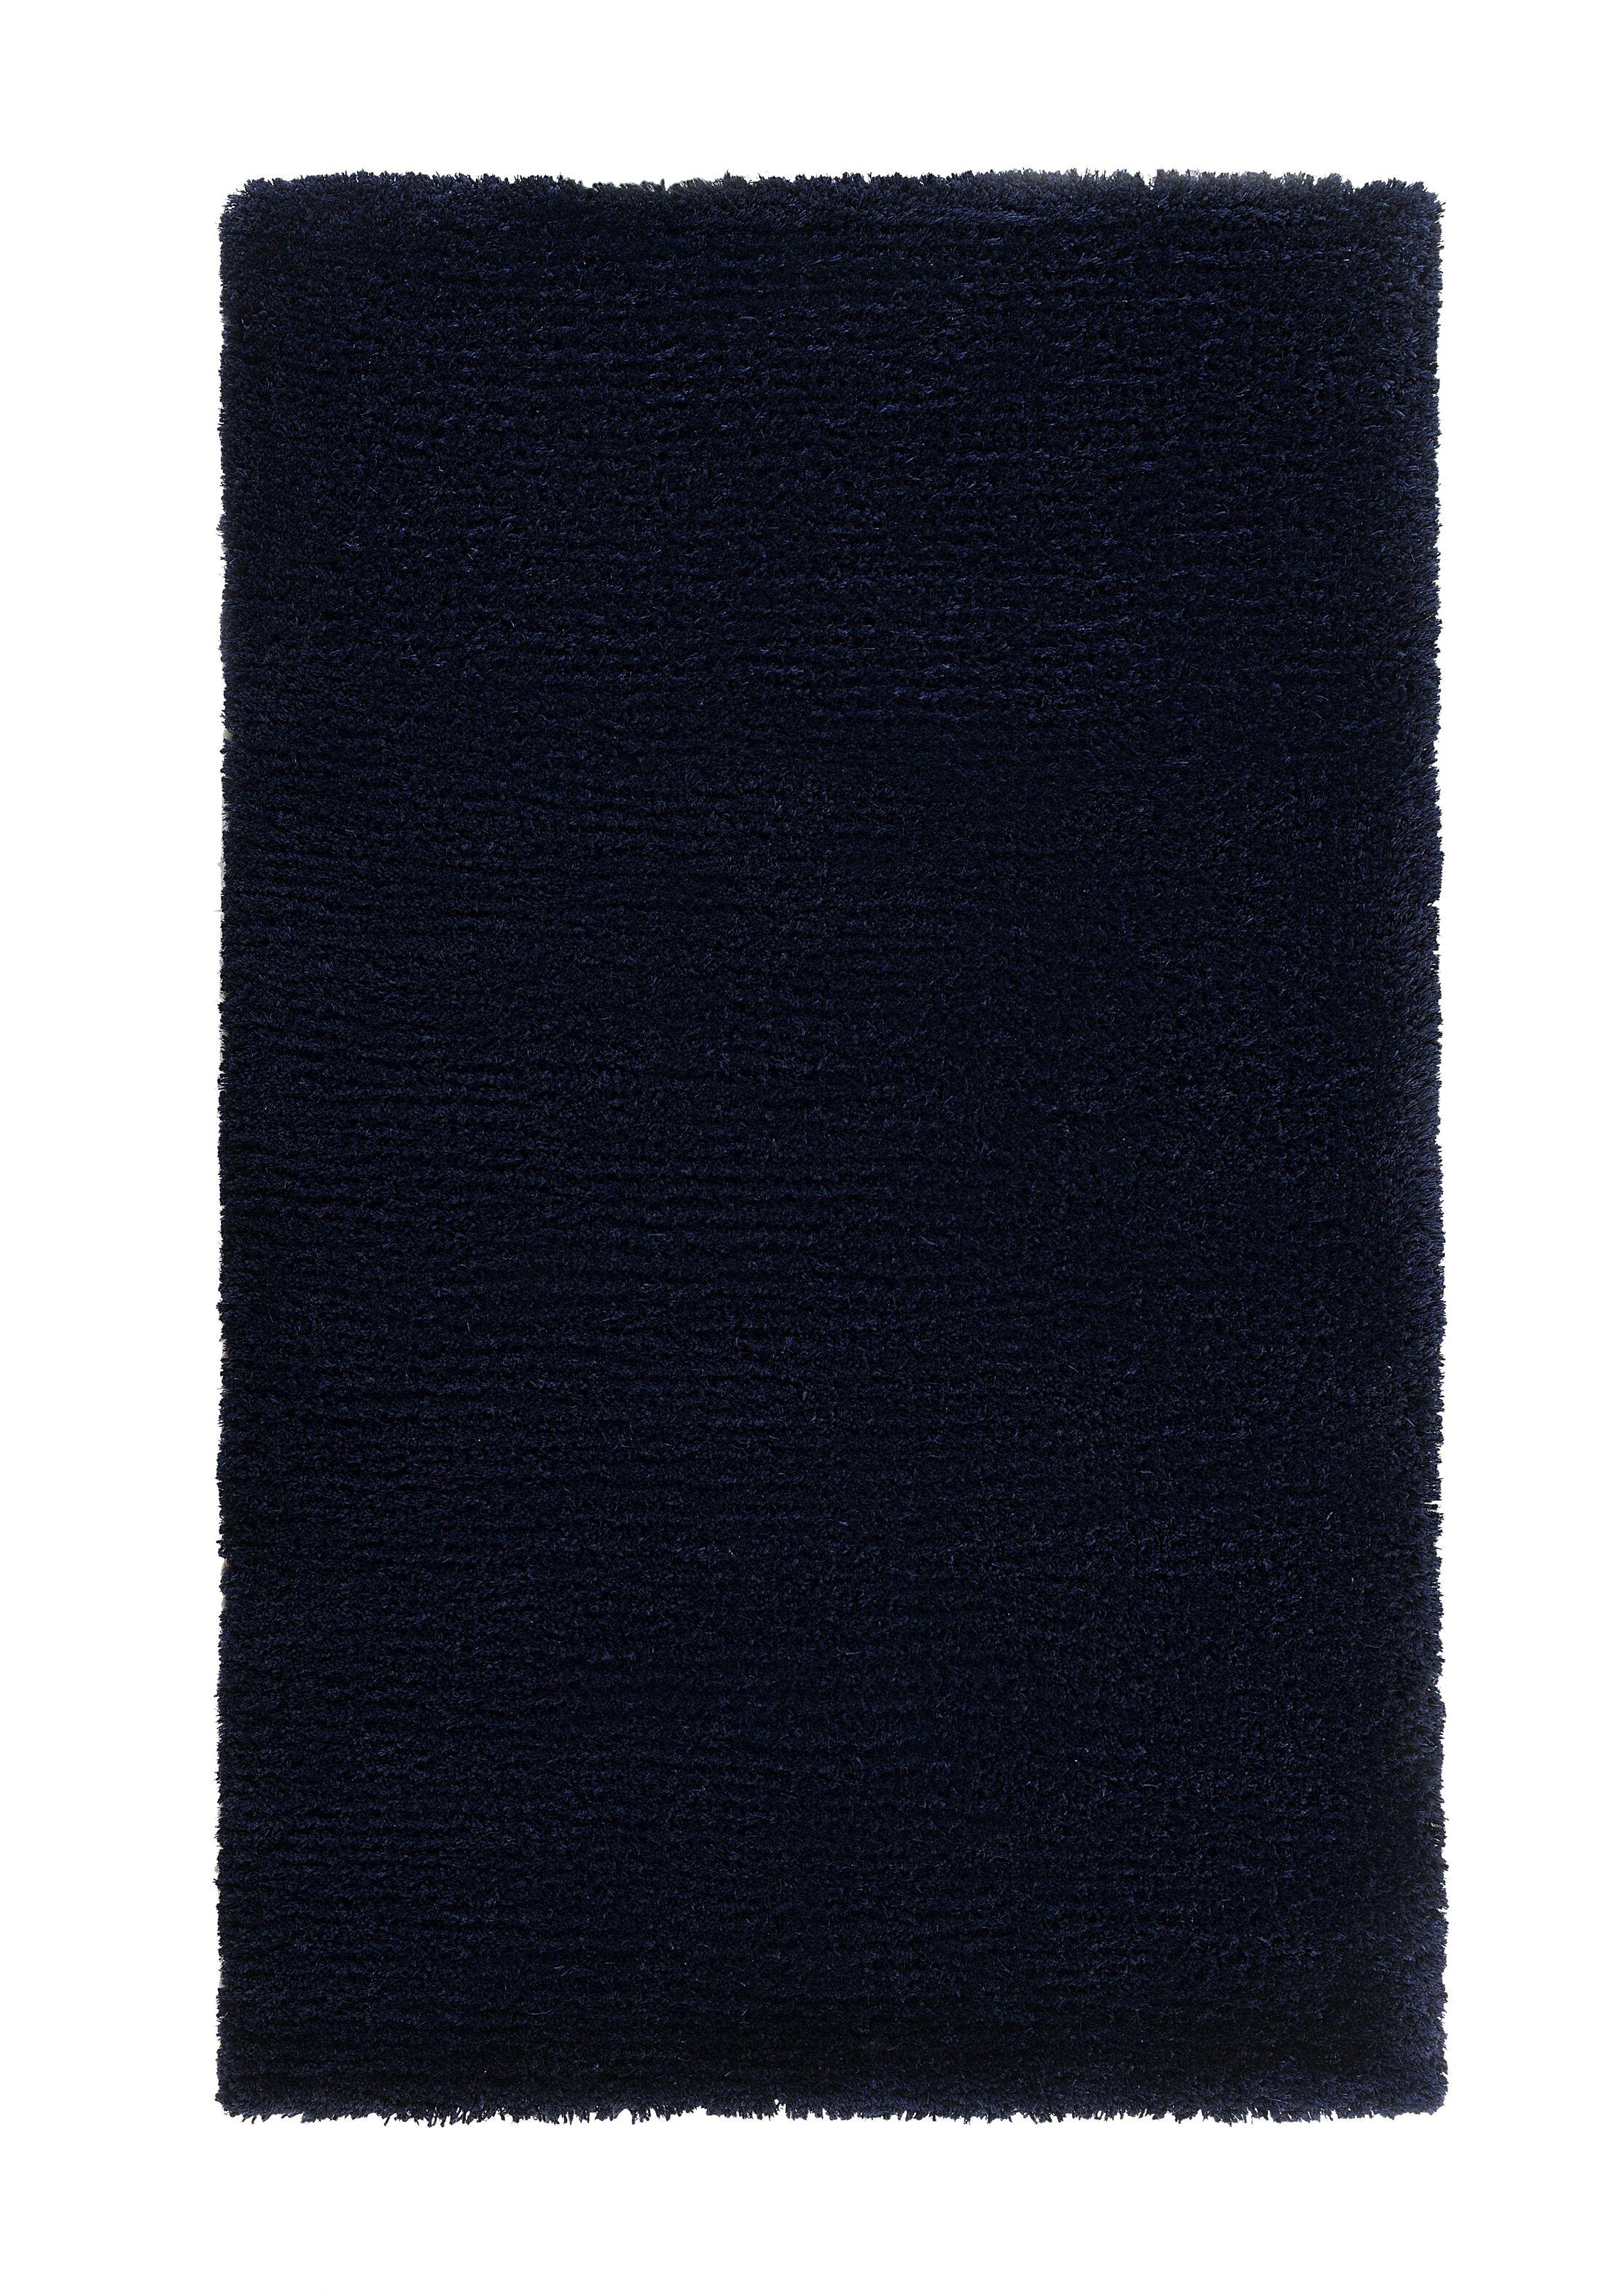 Edirne Hand-Tufted Dark Blue Area Rug Rug Size: Rectangle 2'7